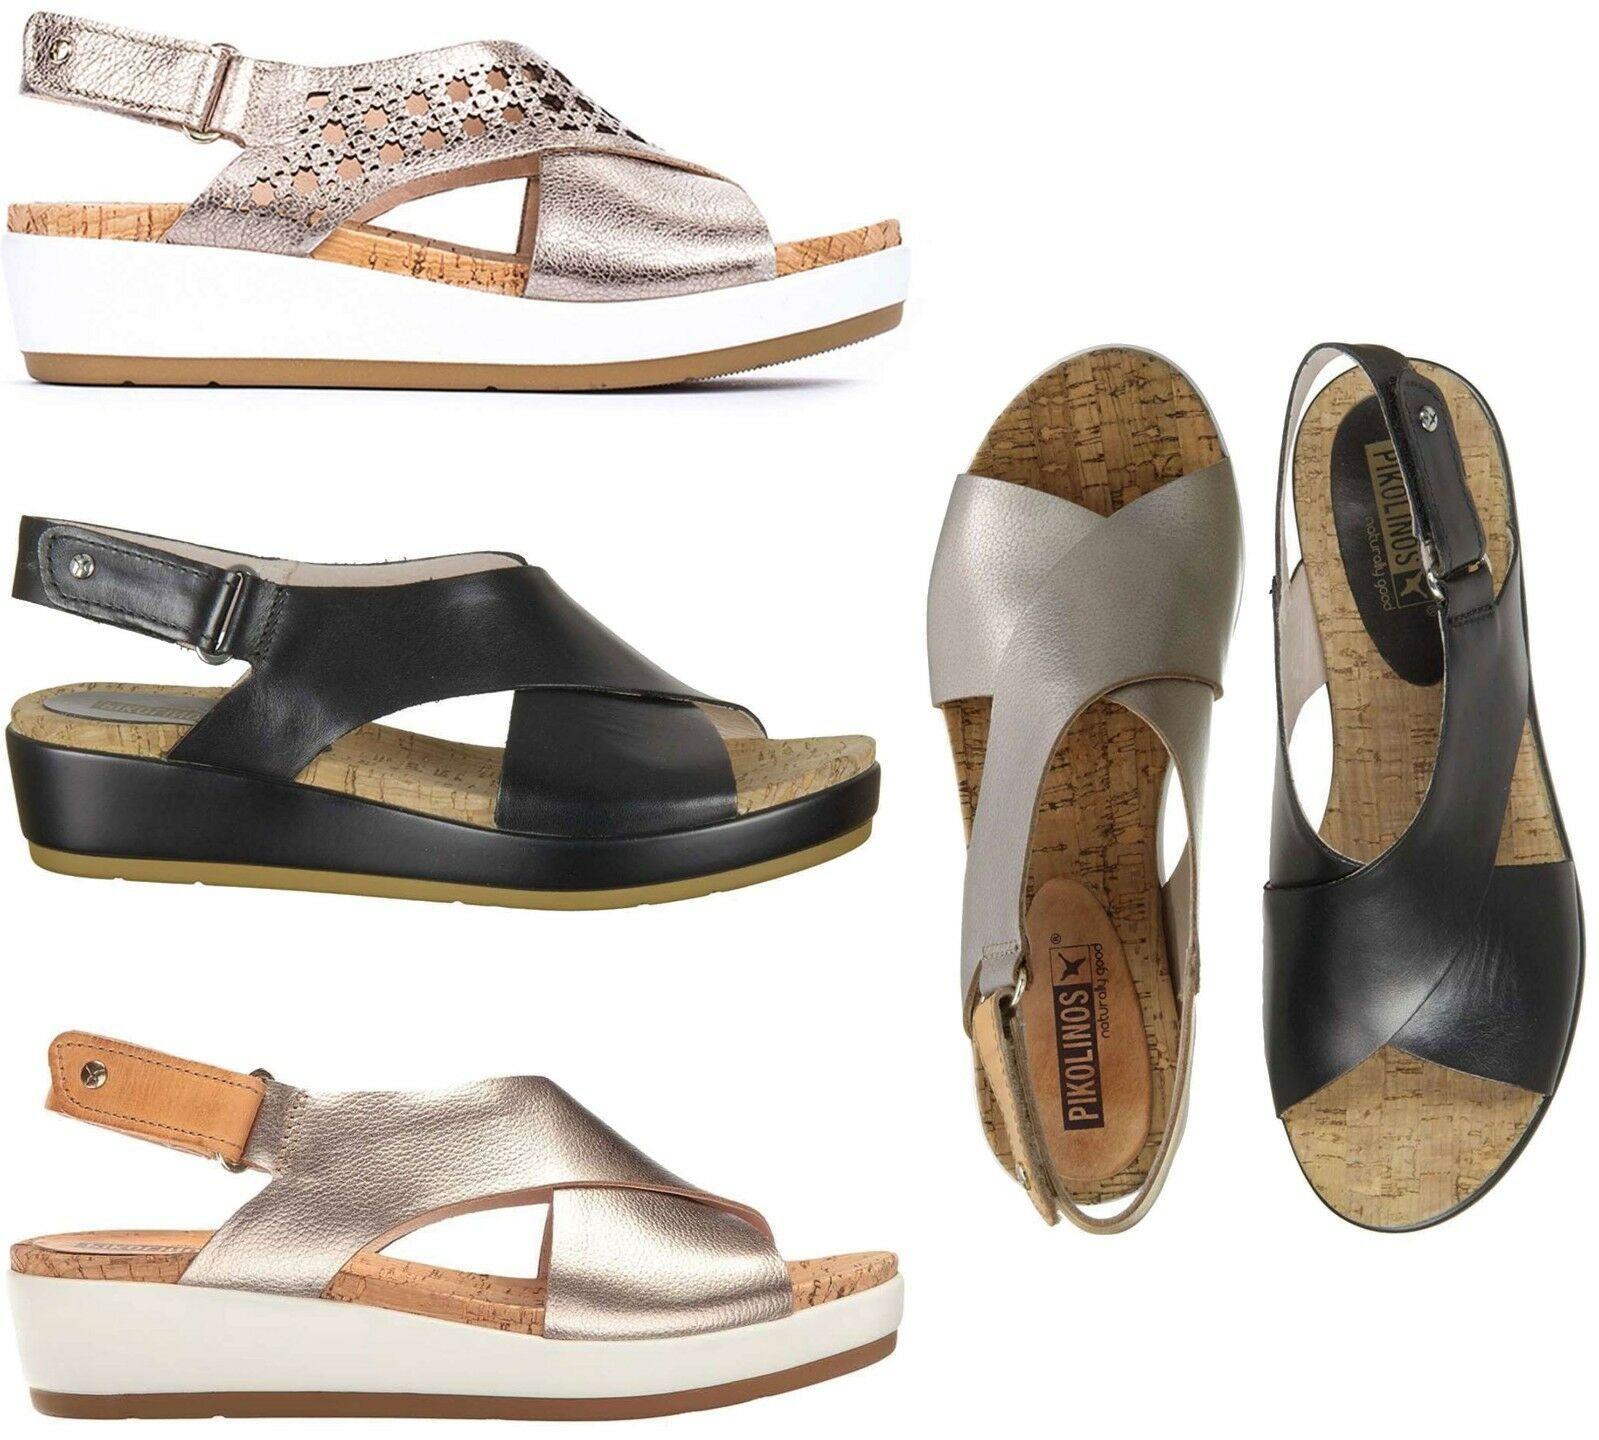 Pikolinos Leather Women Mykonos Comfort Leather Pikolinos Platform Summer Sandals NEW 8dd1d9